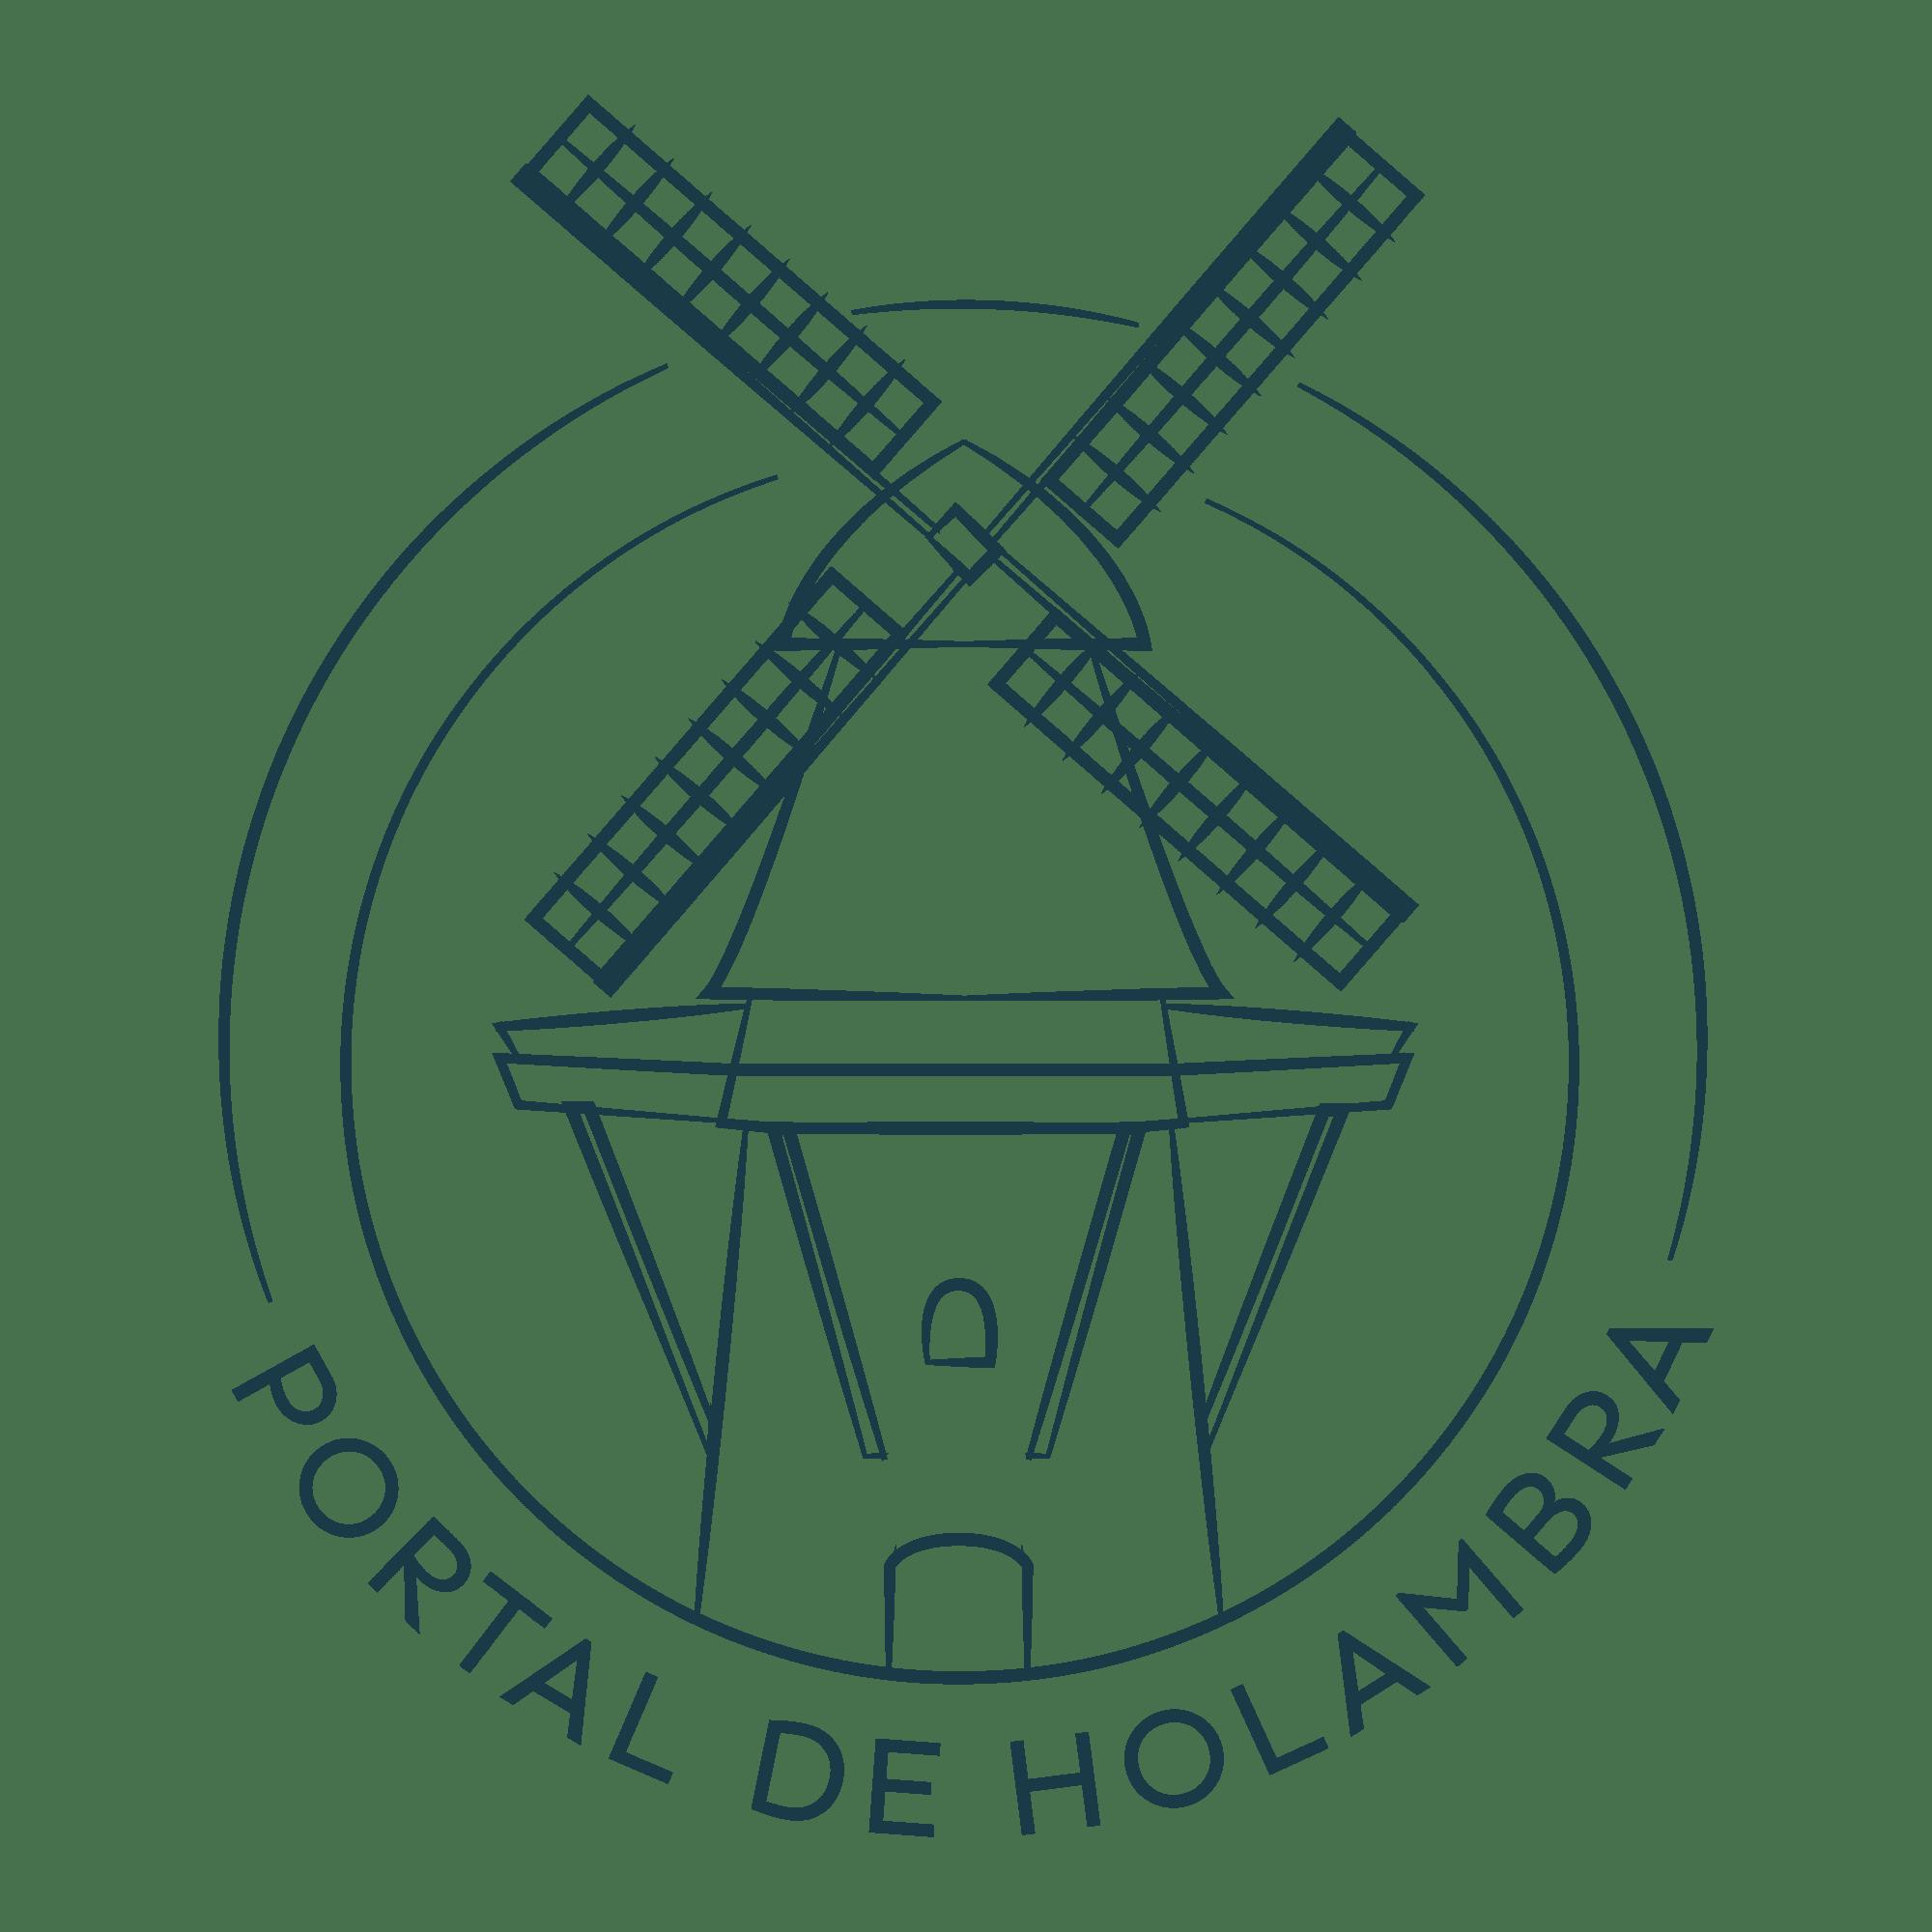 Logotipo Portal de Holambra